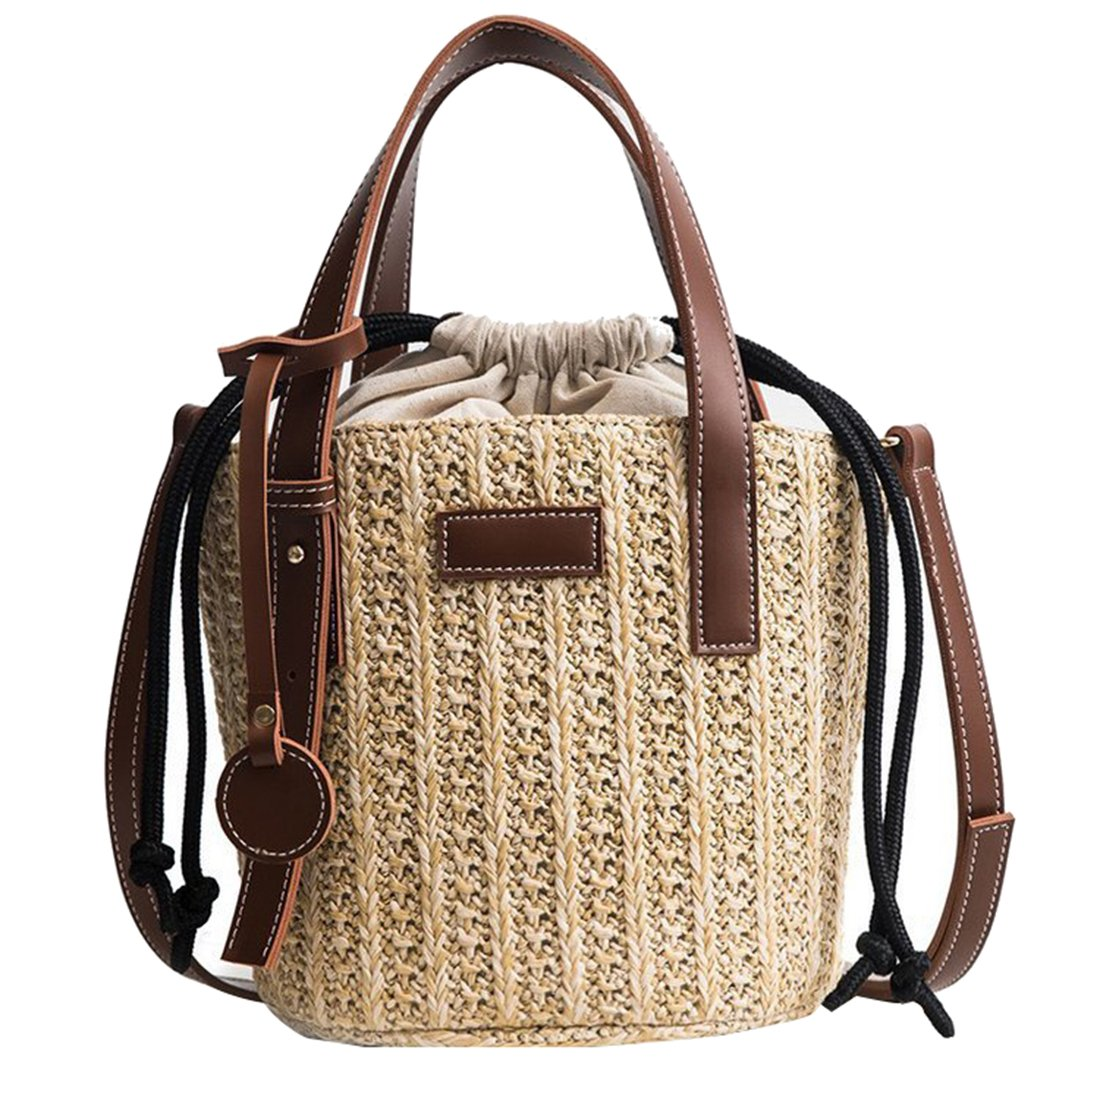 Women Straw Shoulder Bag Summer Beach Bag Tote Bag Cotton Lining Top Handle Hobo Shopper Bucket Bag